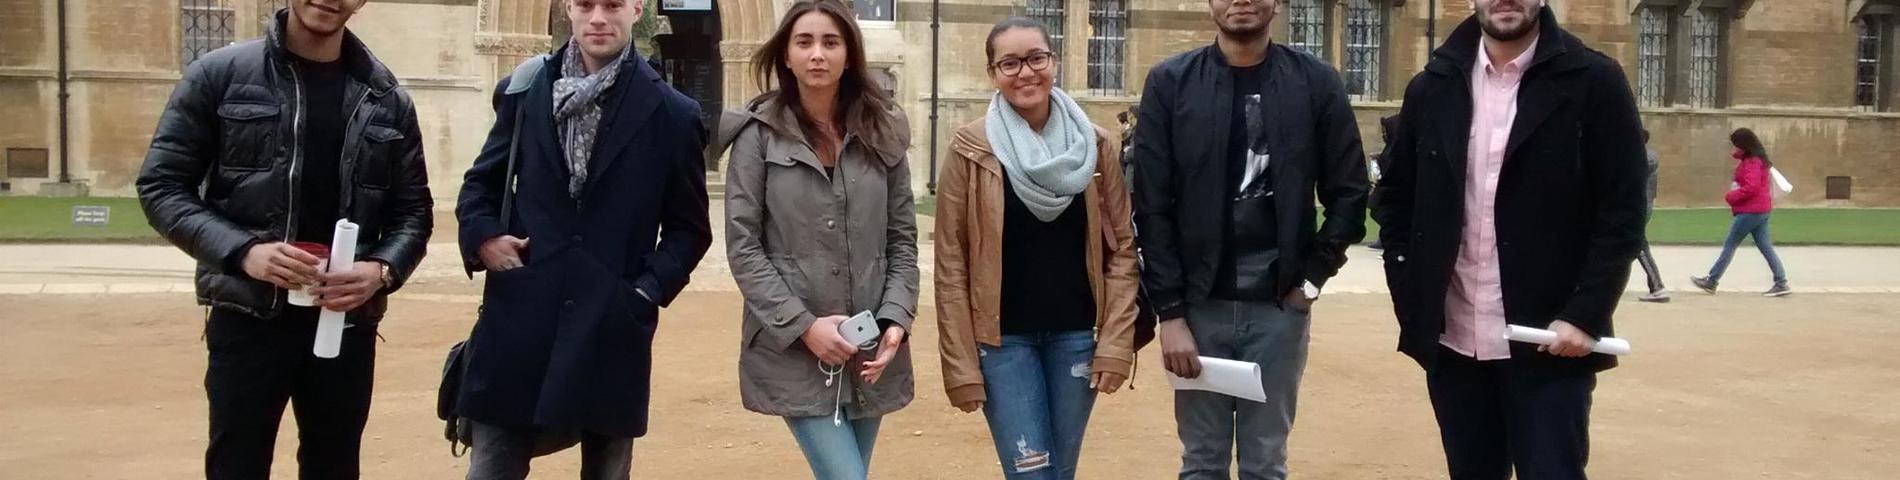 Oxford International Study Centre foto 1